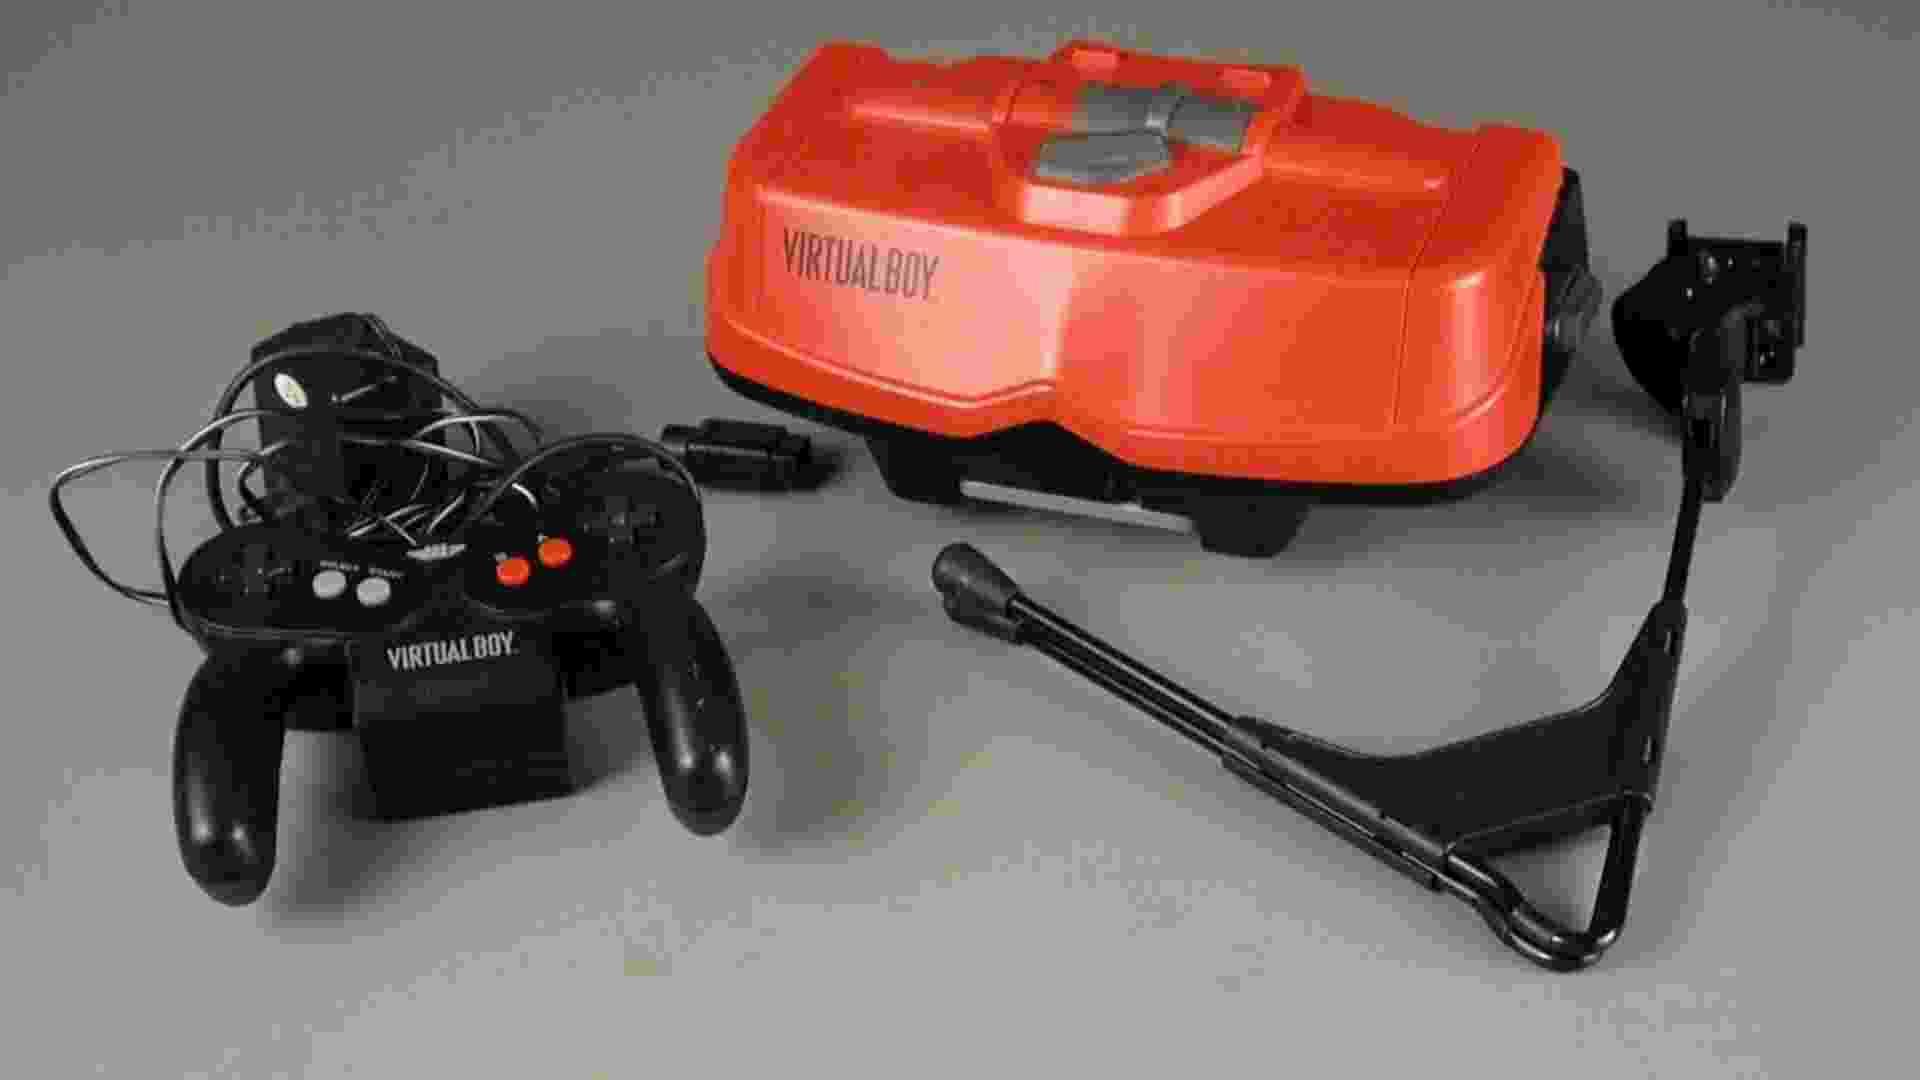 Virtual Boy - Museum of Play